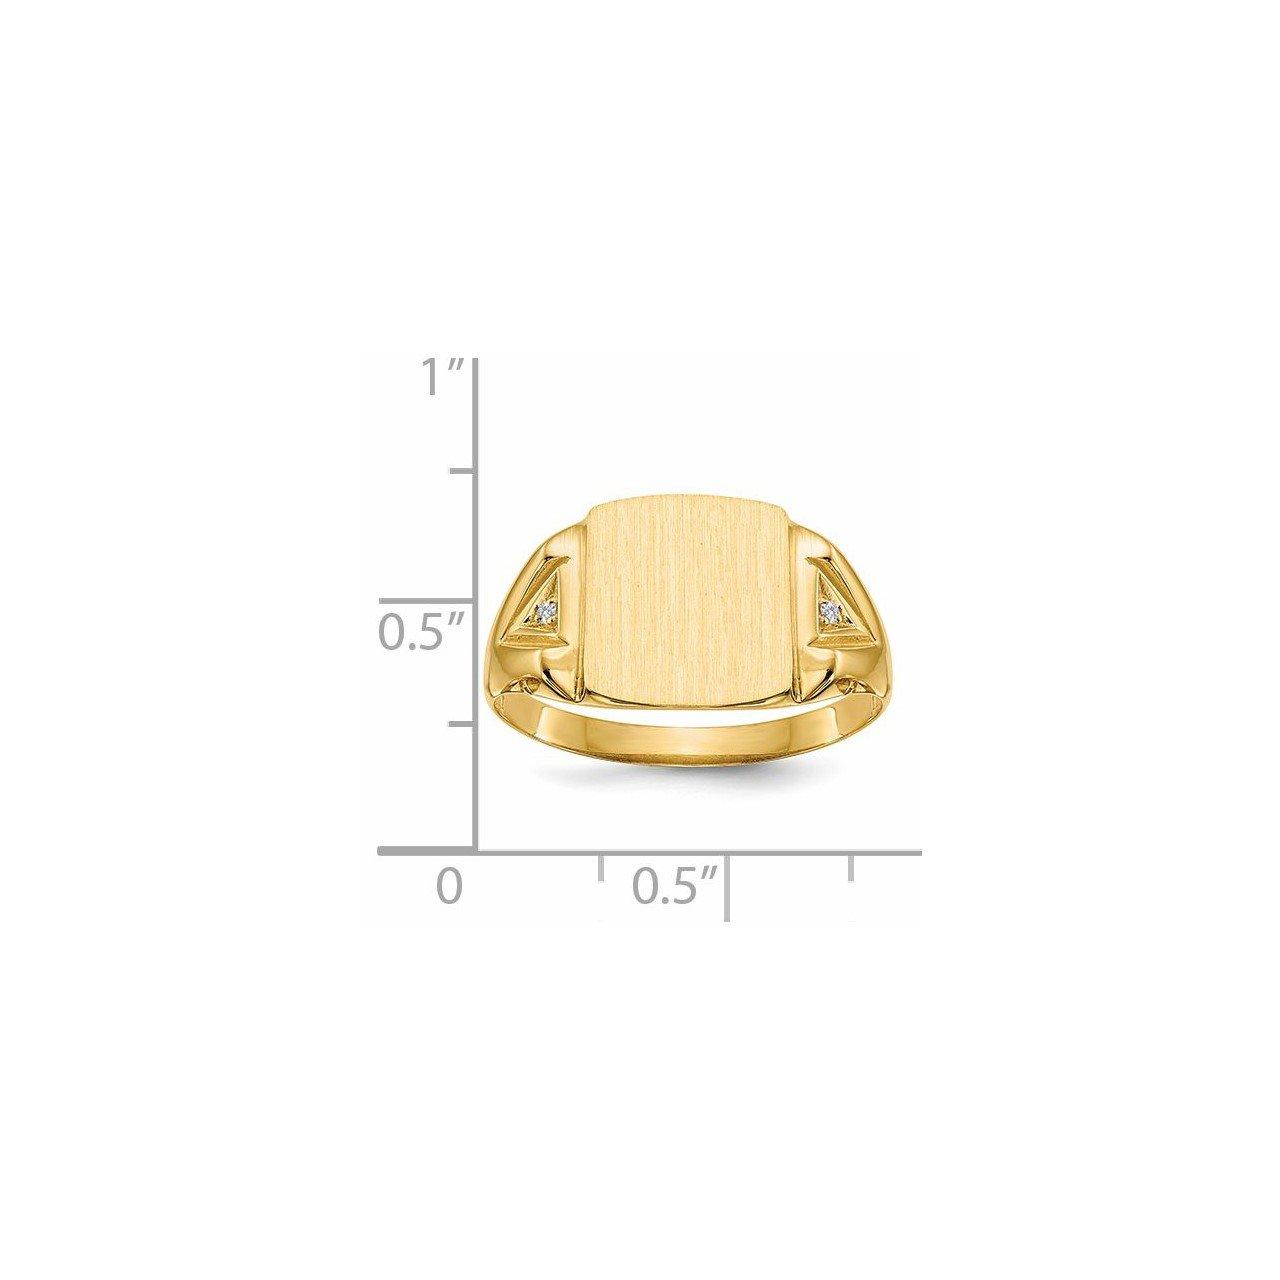 14k 12.0x11.0mm Open Back AA Diamond Men's Signet Ring-4